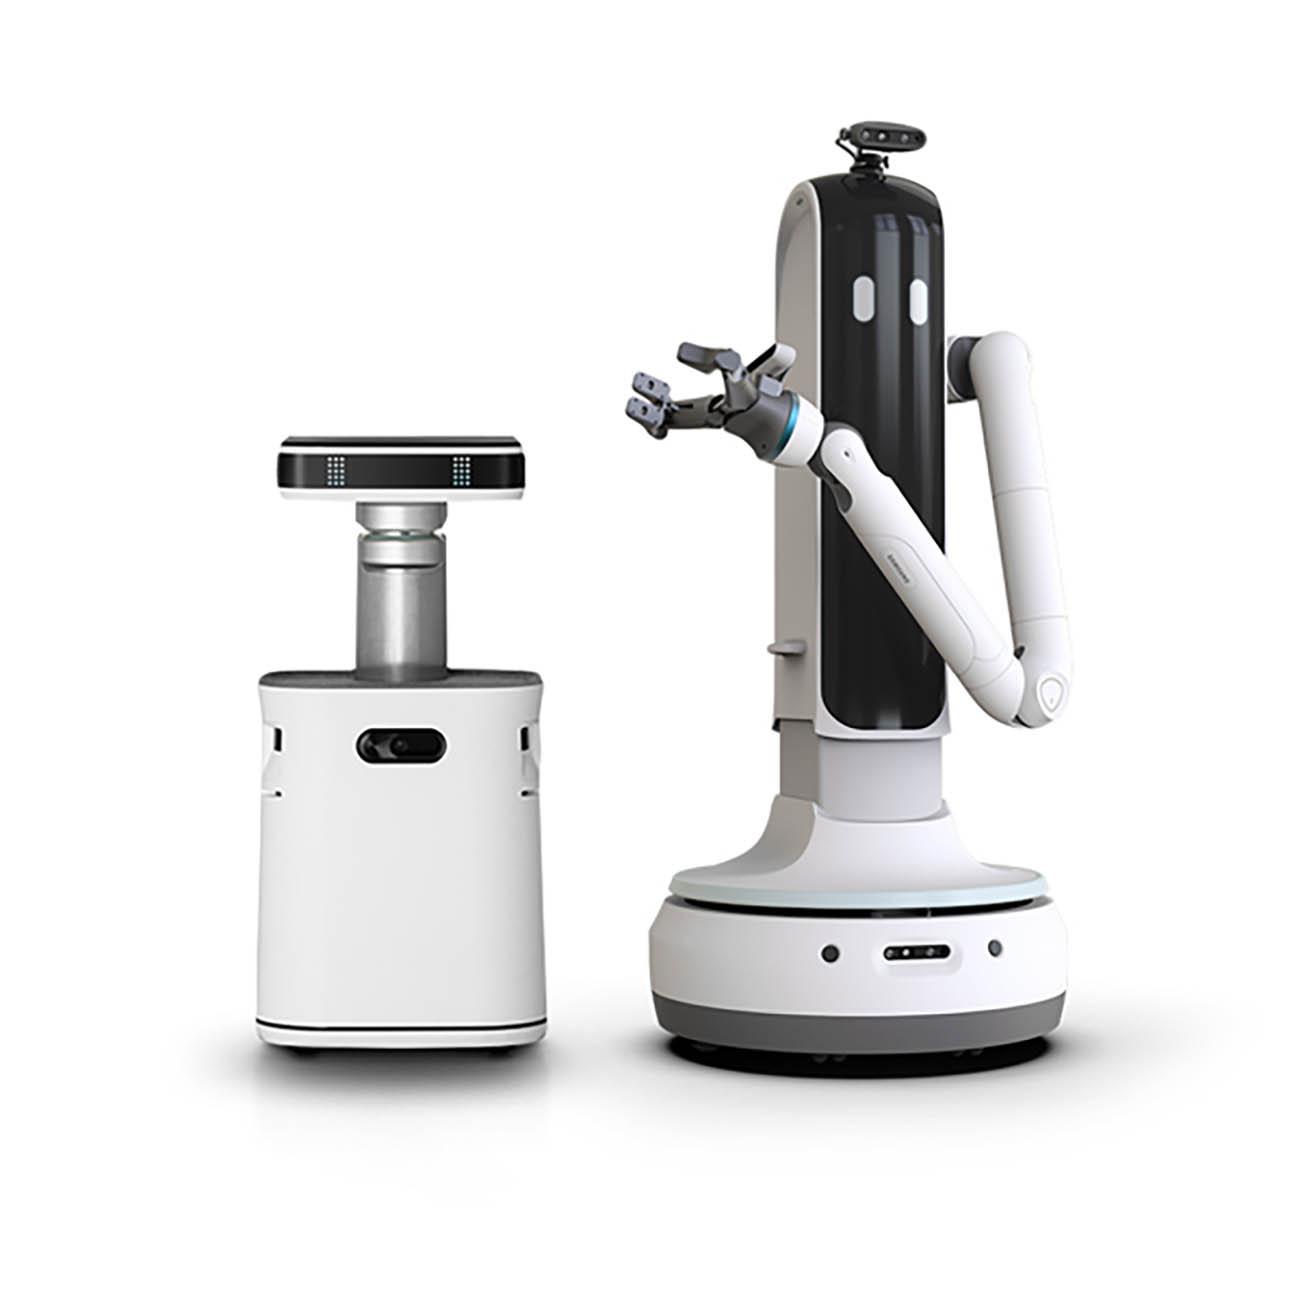 samsung robot ces 2021